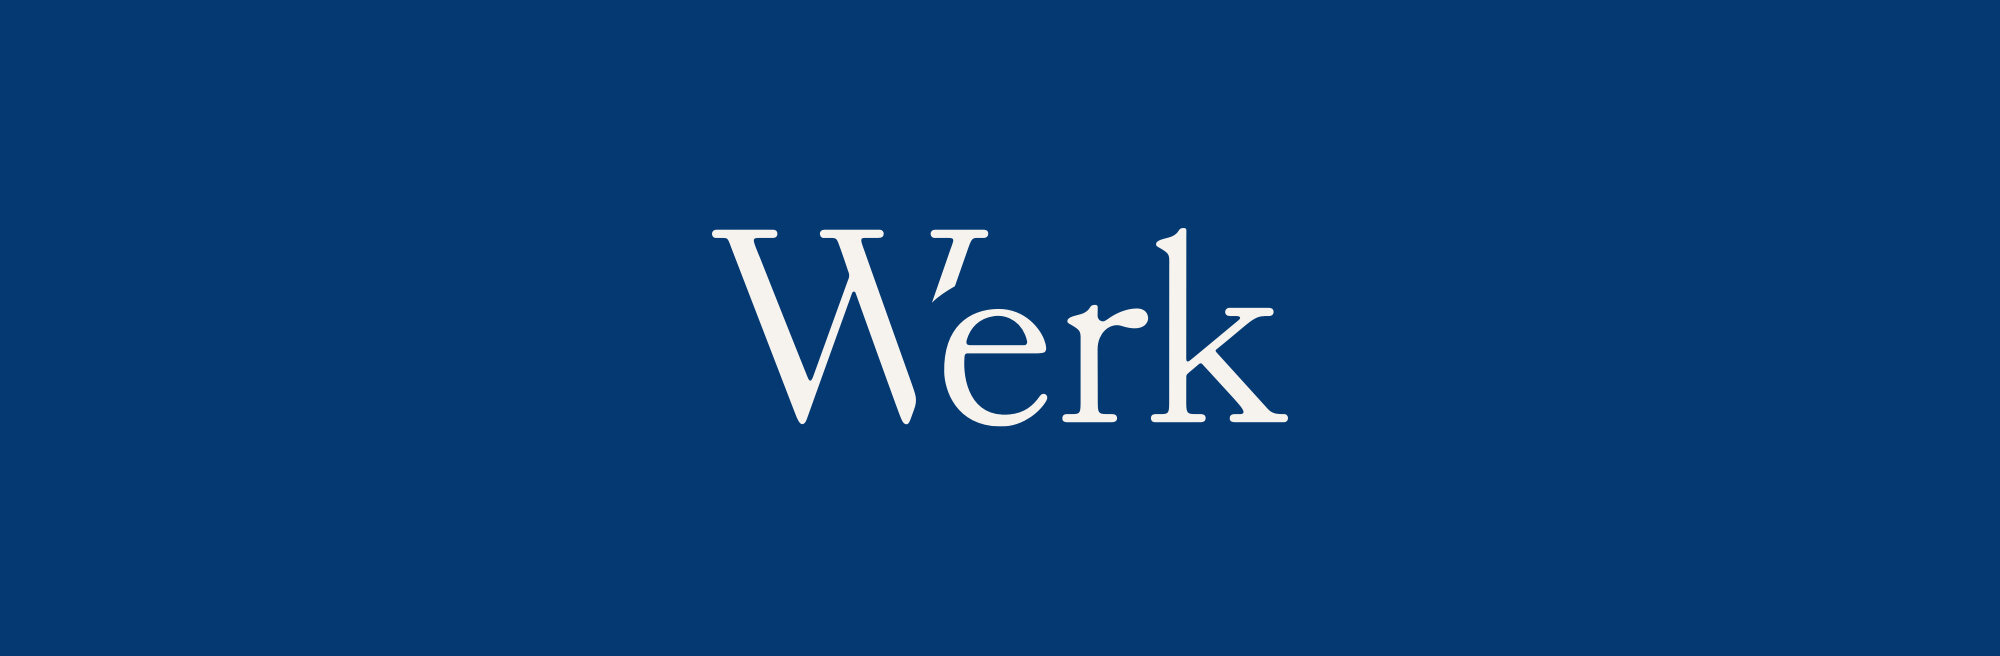 I redrew the original logo but decided to keep a likeness of the original to preserve the brand legitimacy Werk had already achieved